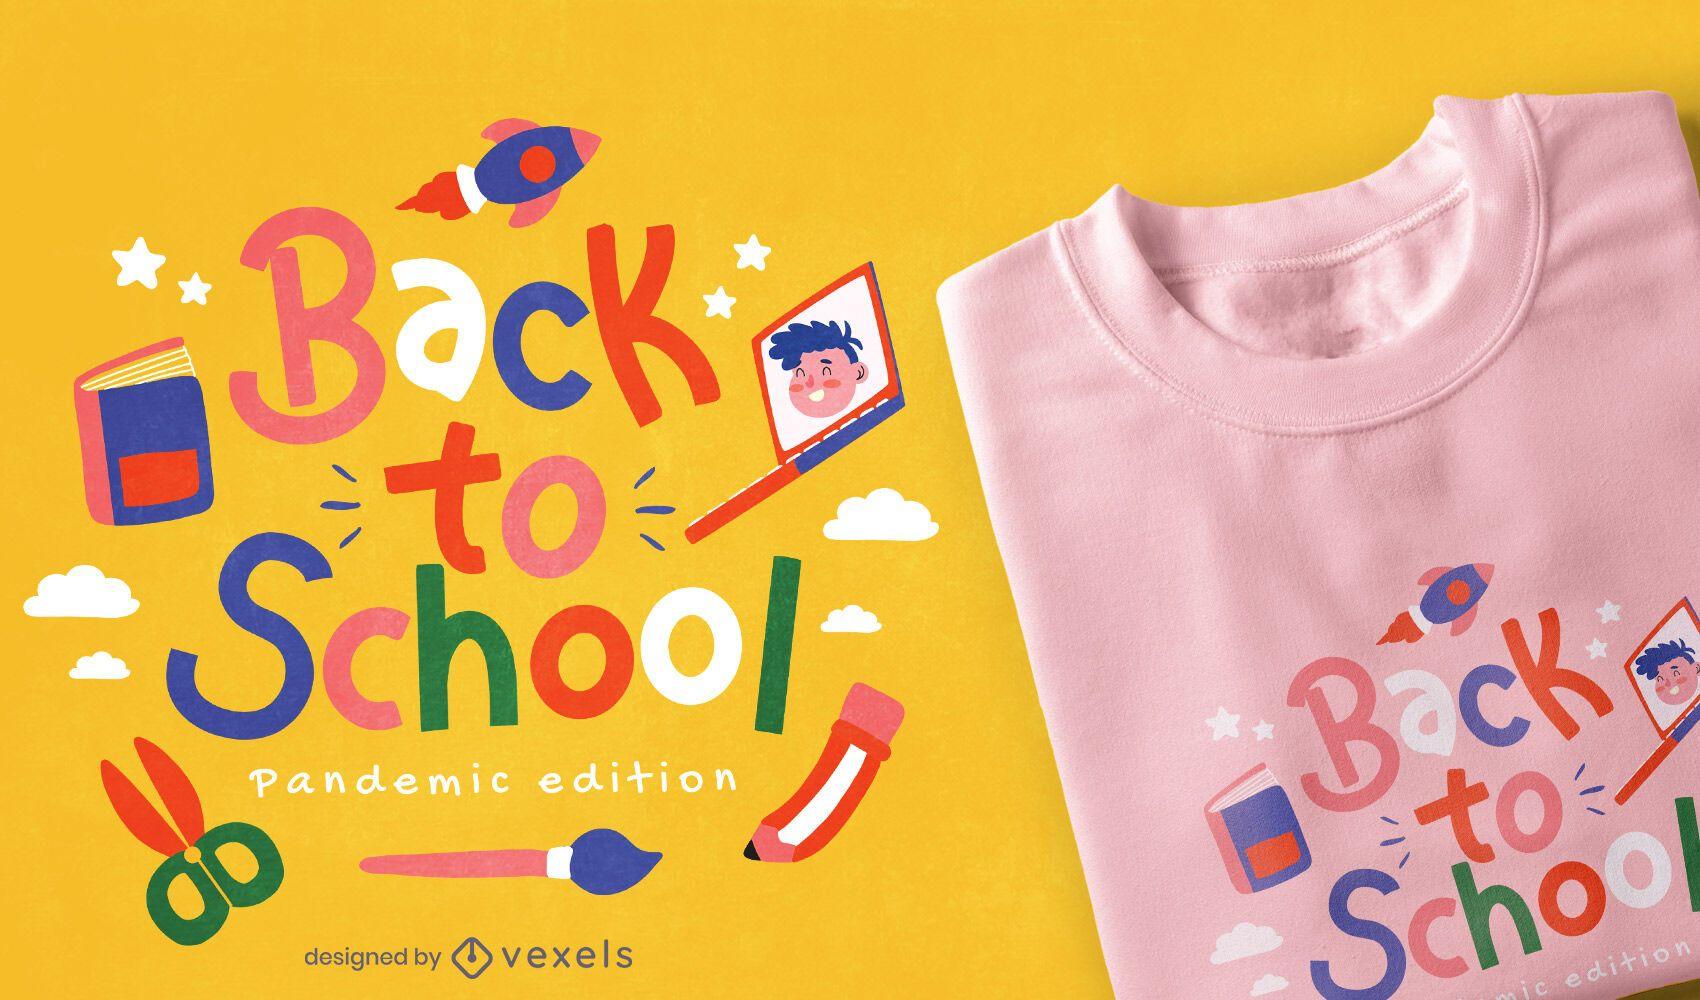 Back to school pandemic t-shirt design